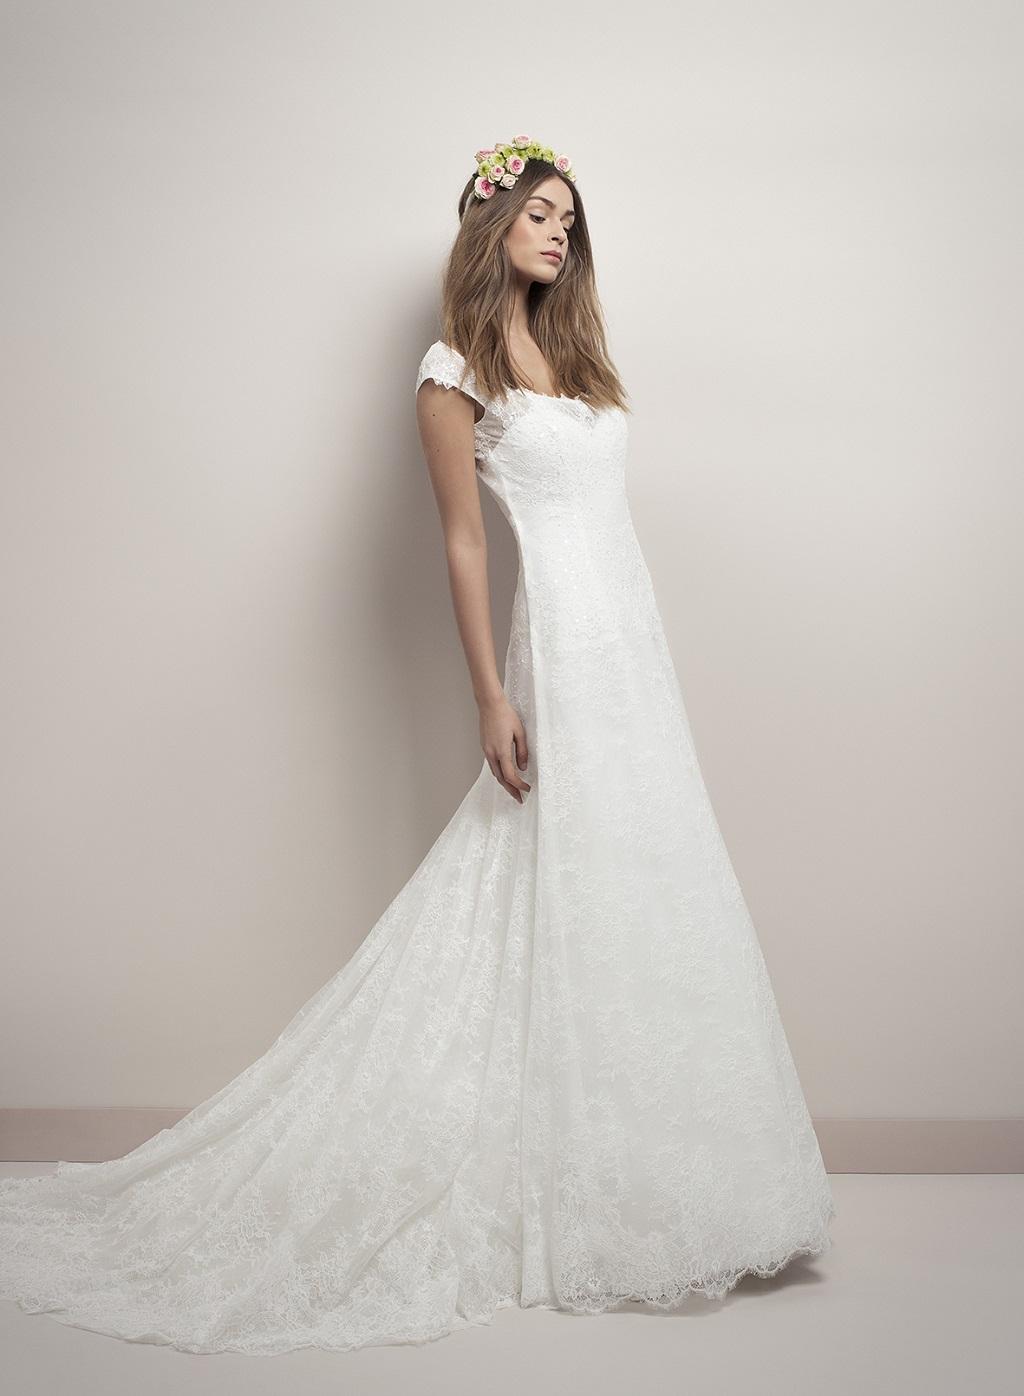 Robe de mariage pour un oui